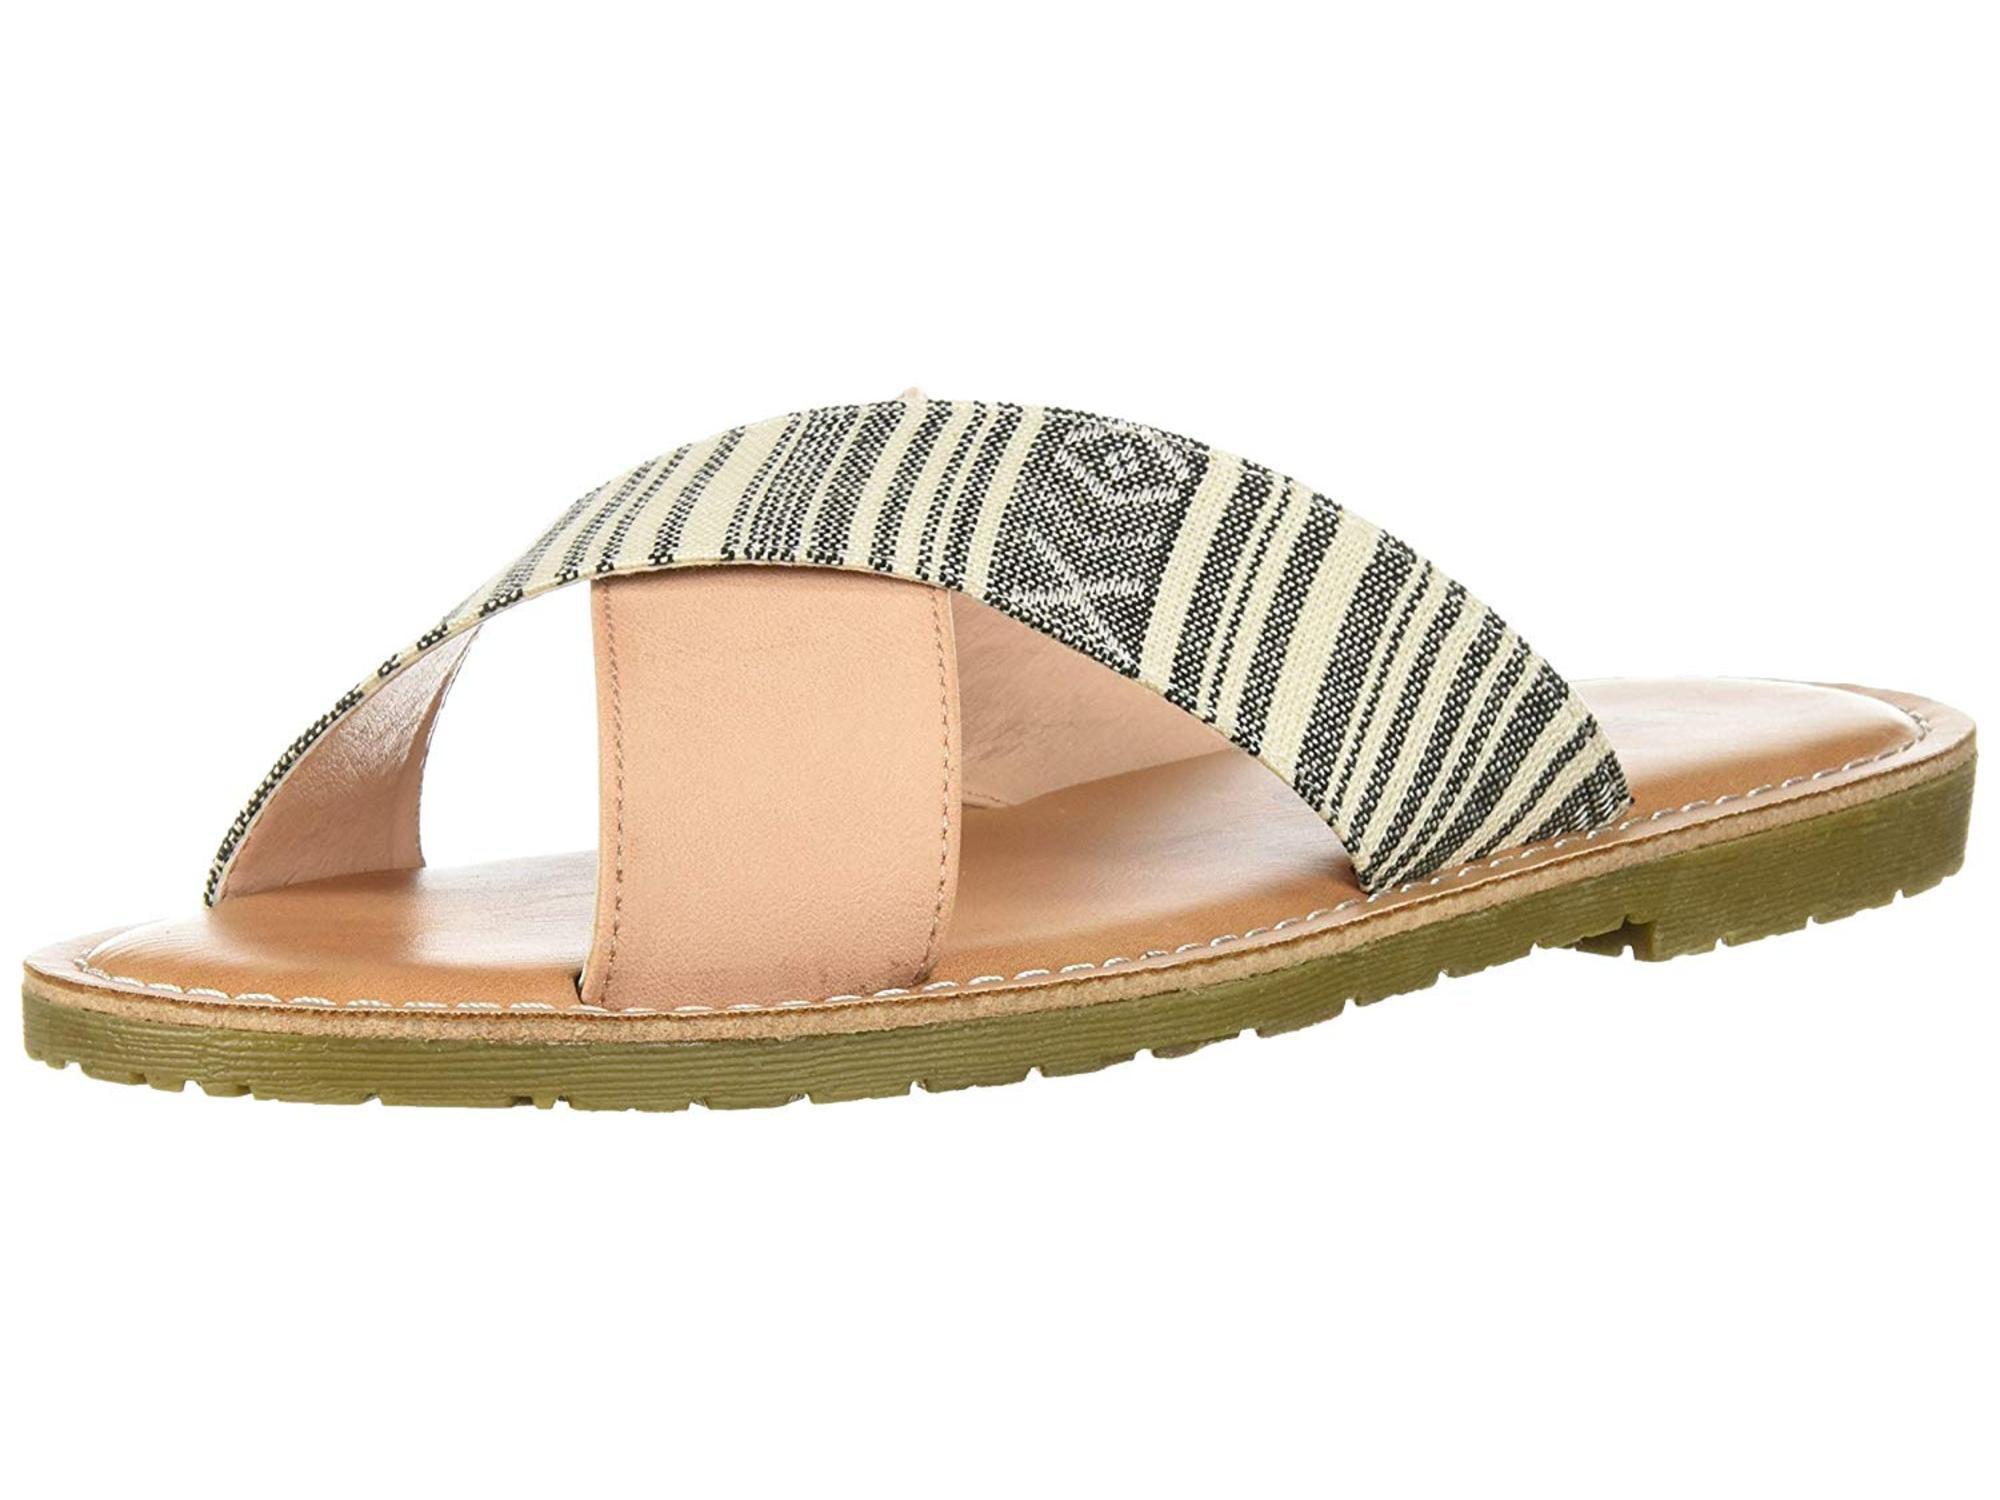 a6c52fa041d Dirty laundry womens edie slide sandal jpg 2000x1500 Womens dirty laundry  sandals